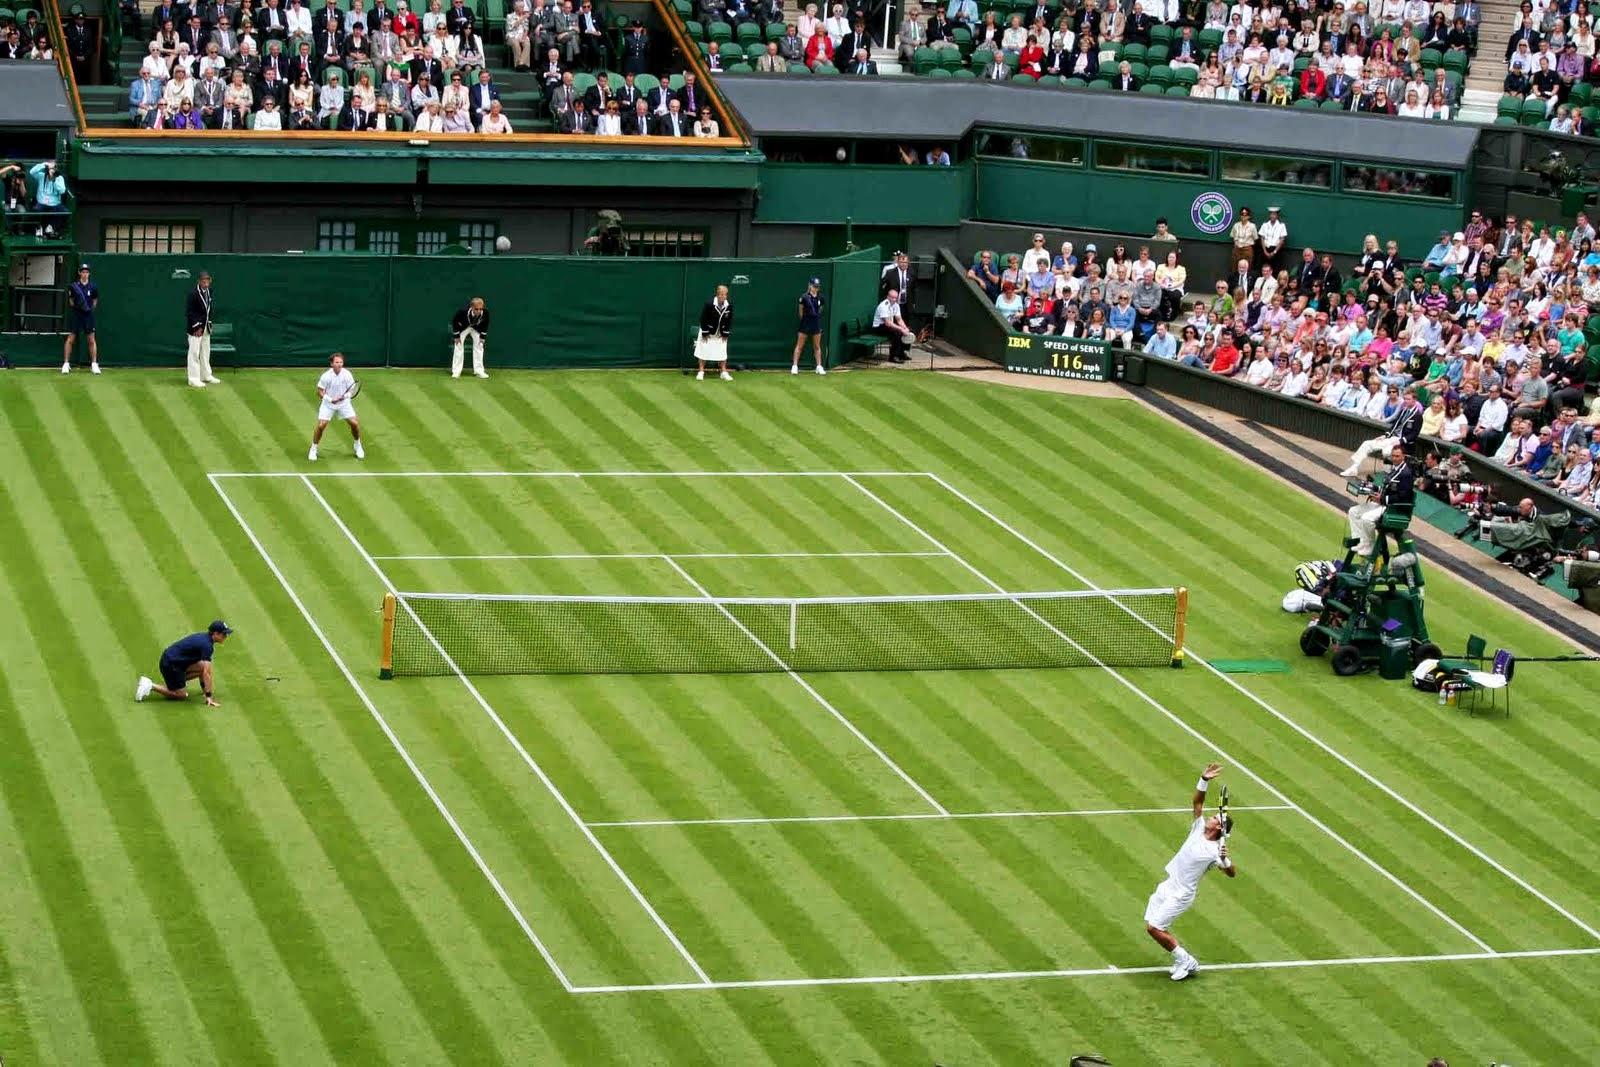 Finale Wimbledon